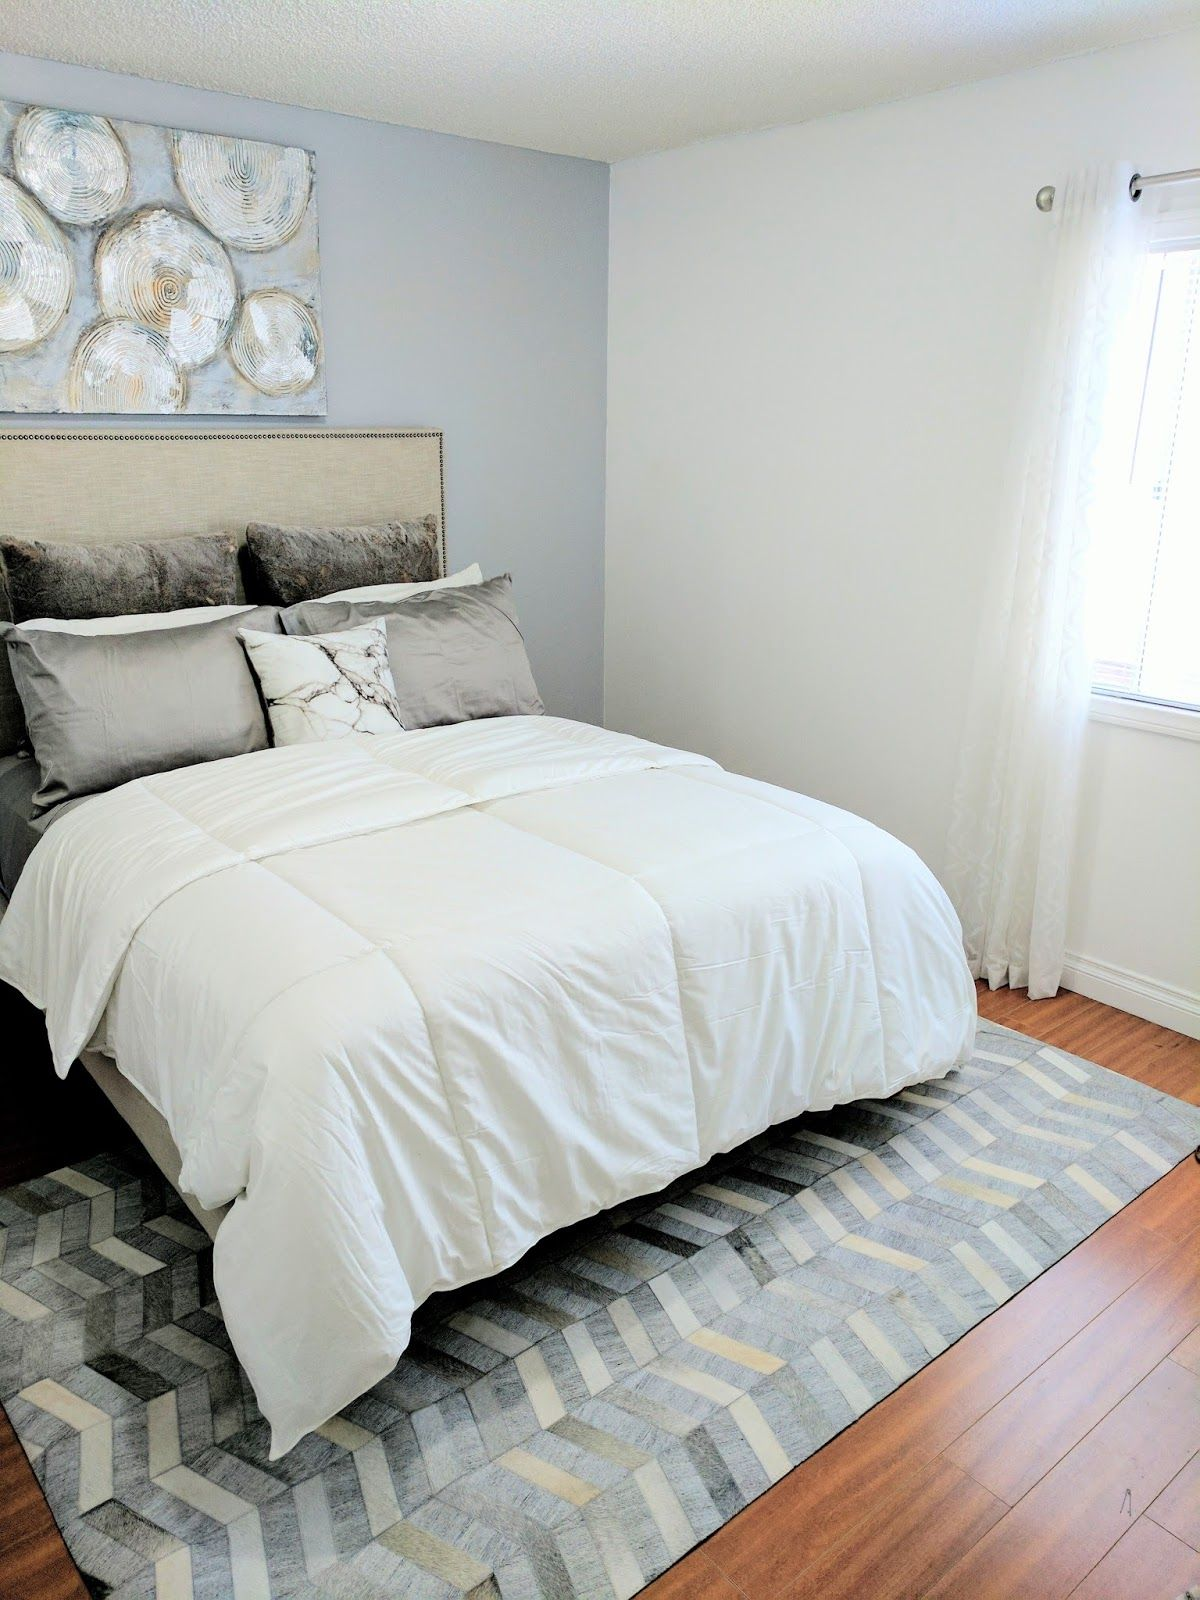 Master bedroom refresh with Rugs USA s Mandovi Cowhide AL01 Rug